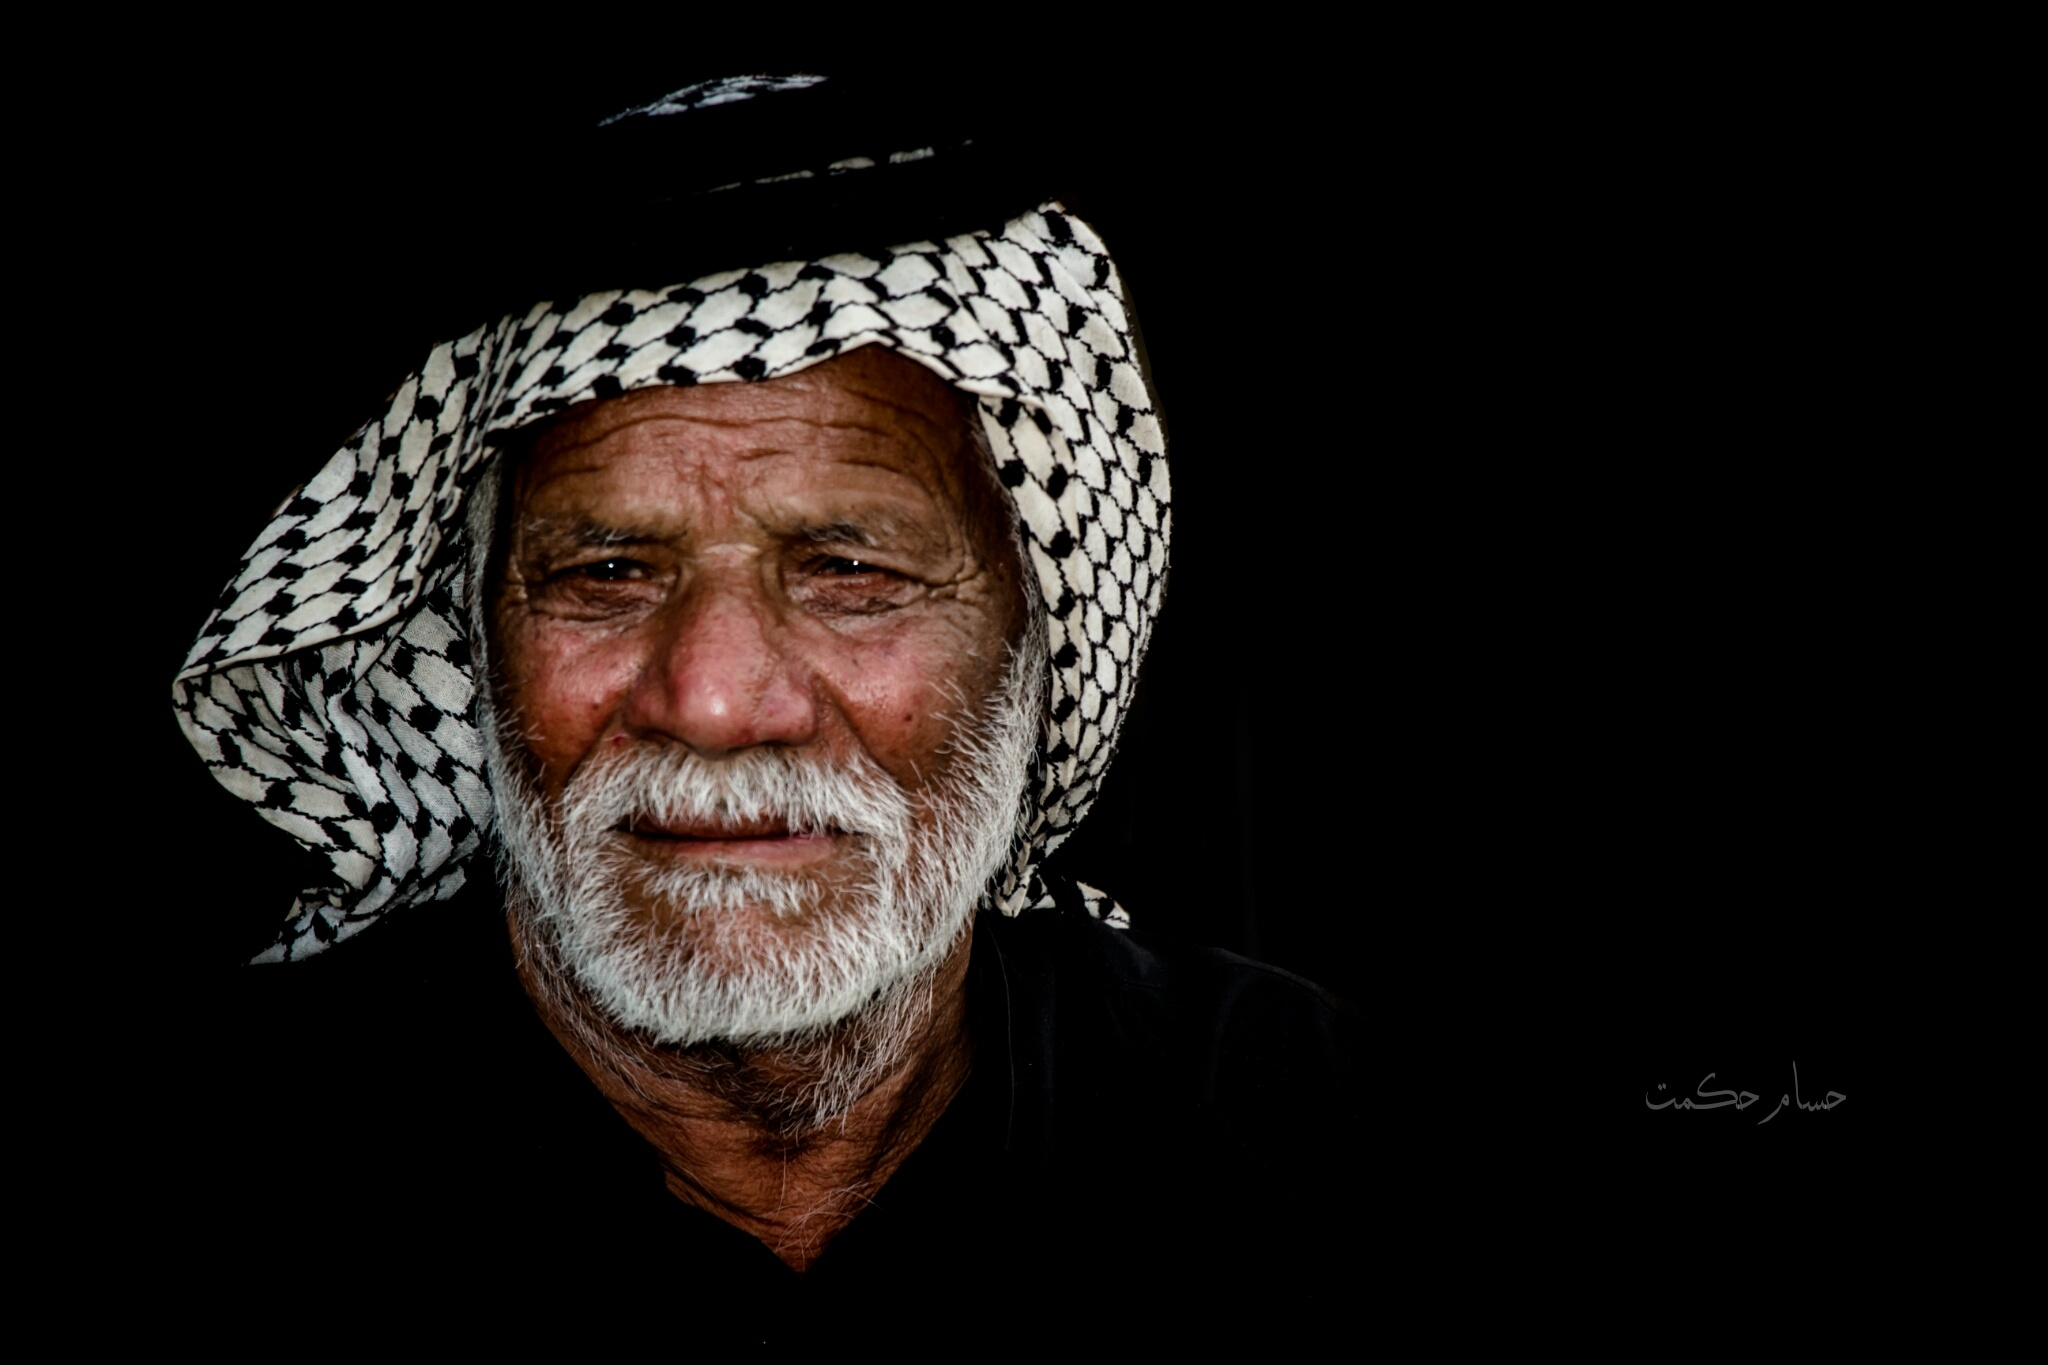 #National #bleeding by Husam Hikmat